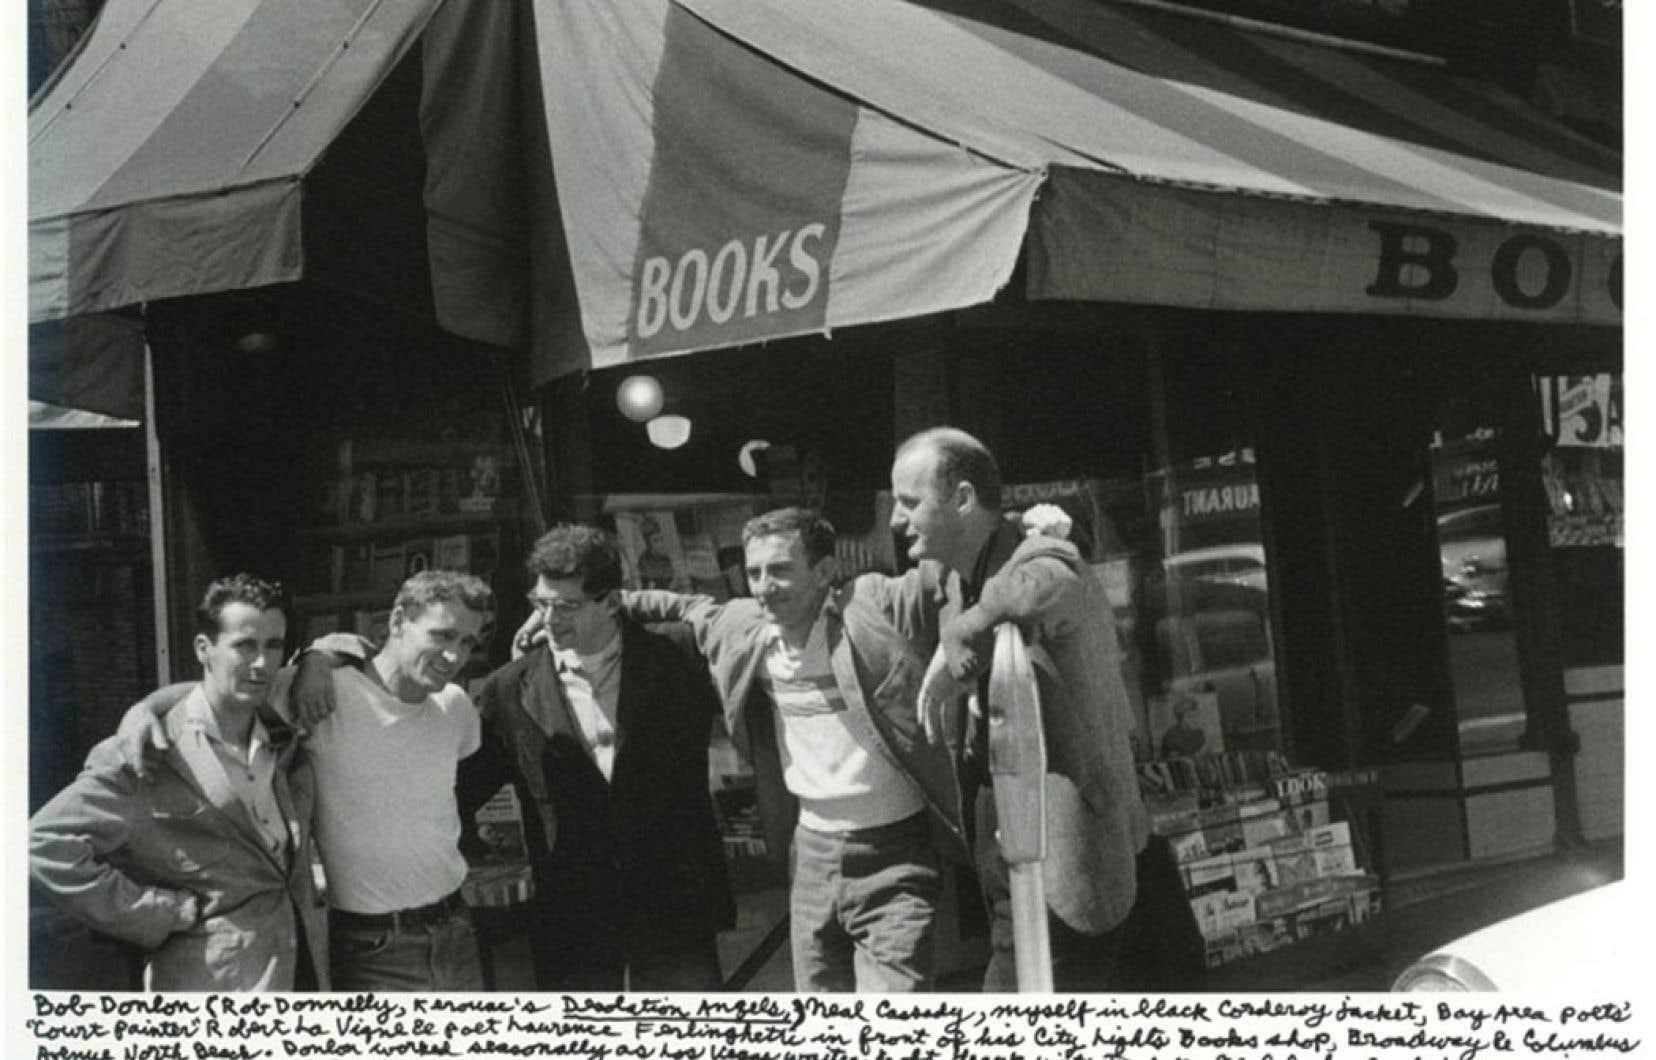 Des figures de la Beat Generation: Bob Donlon, Neal Cassady, Allen Ginsberg, Robert Lavigne et Lawrence Ferlinghetti.